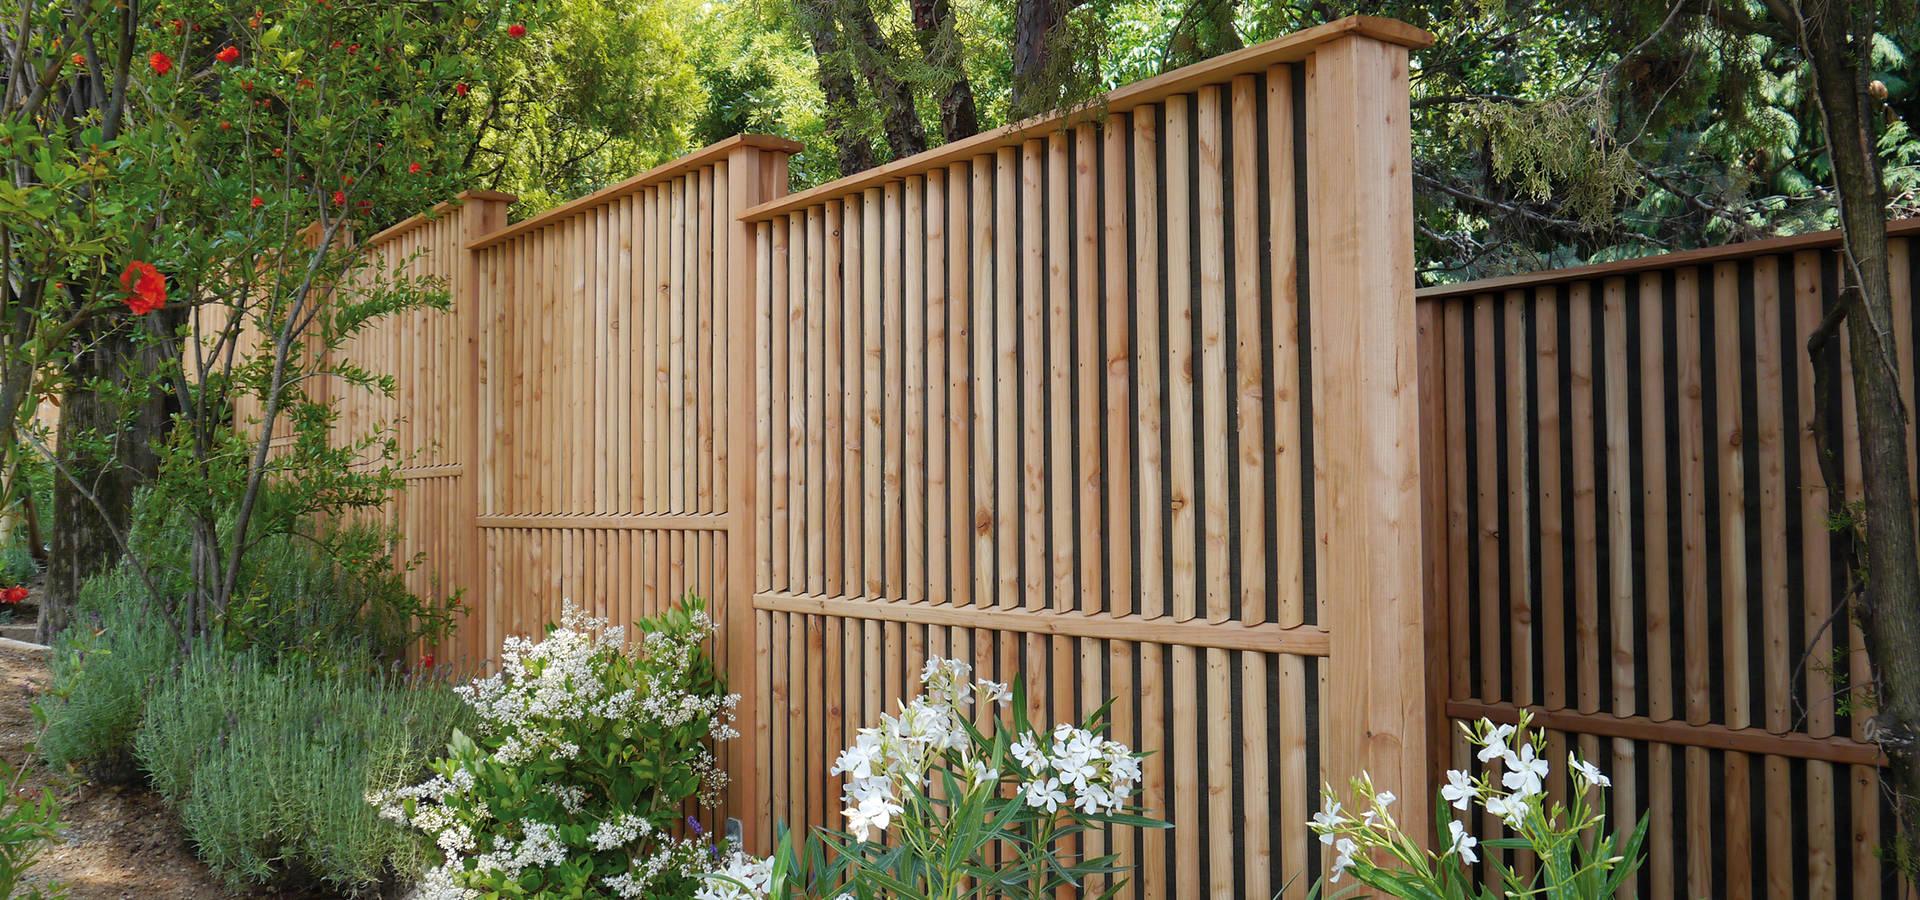 Braun & Würfele—Holz im Garten